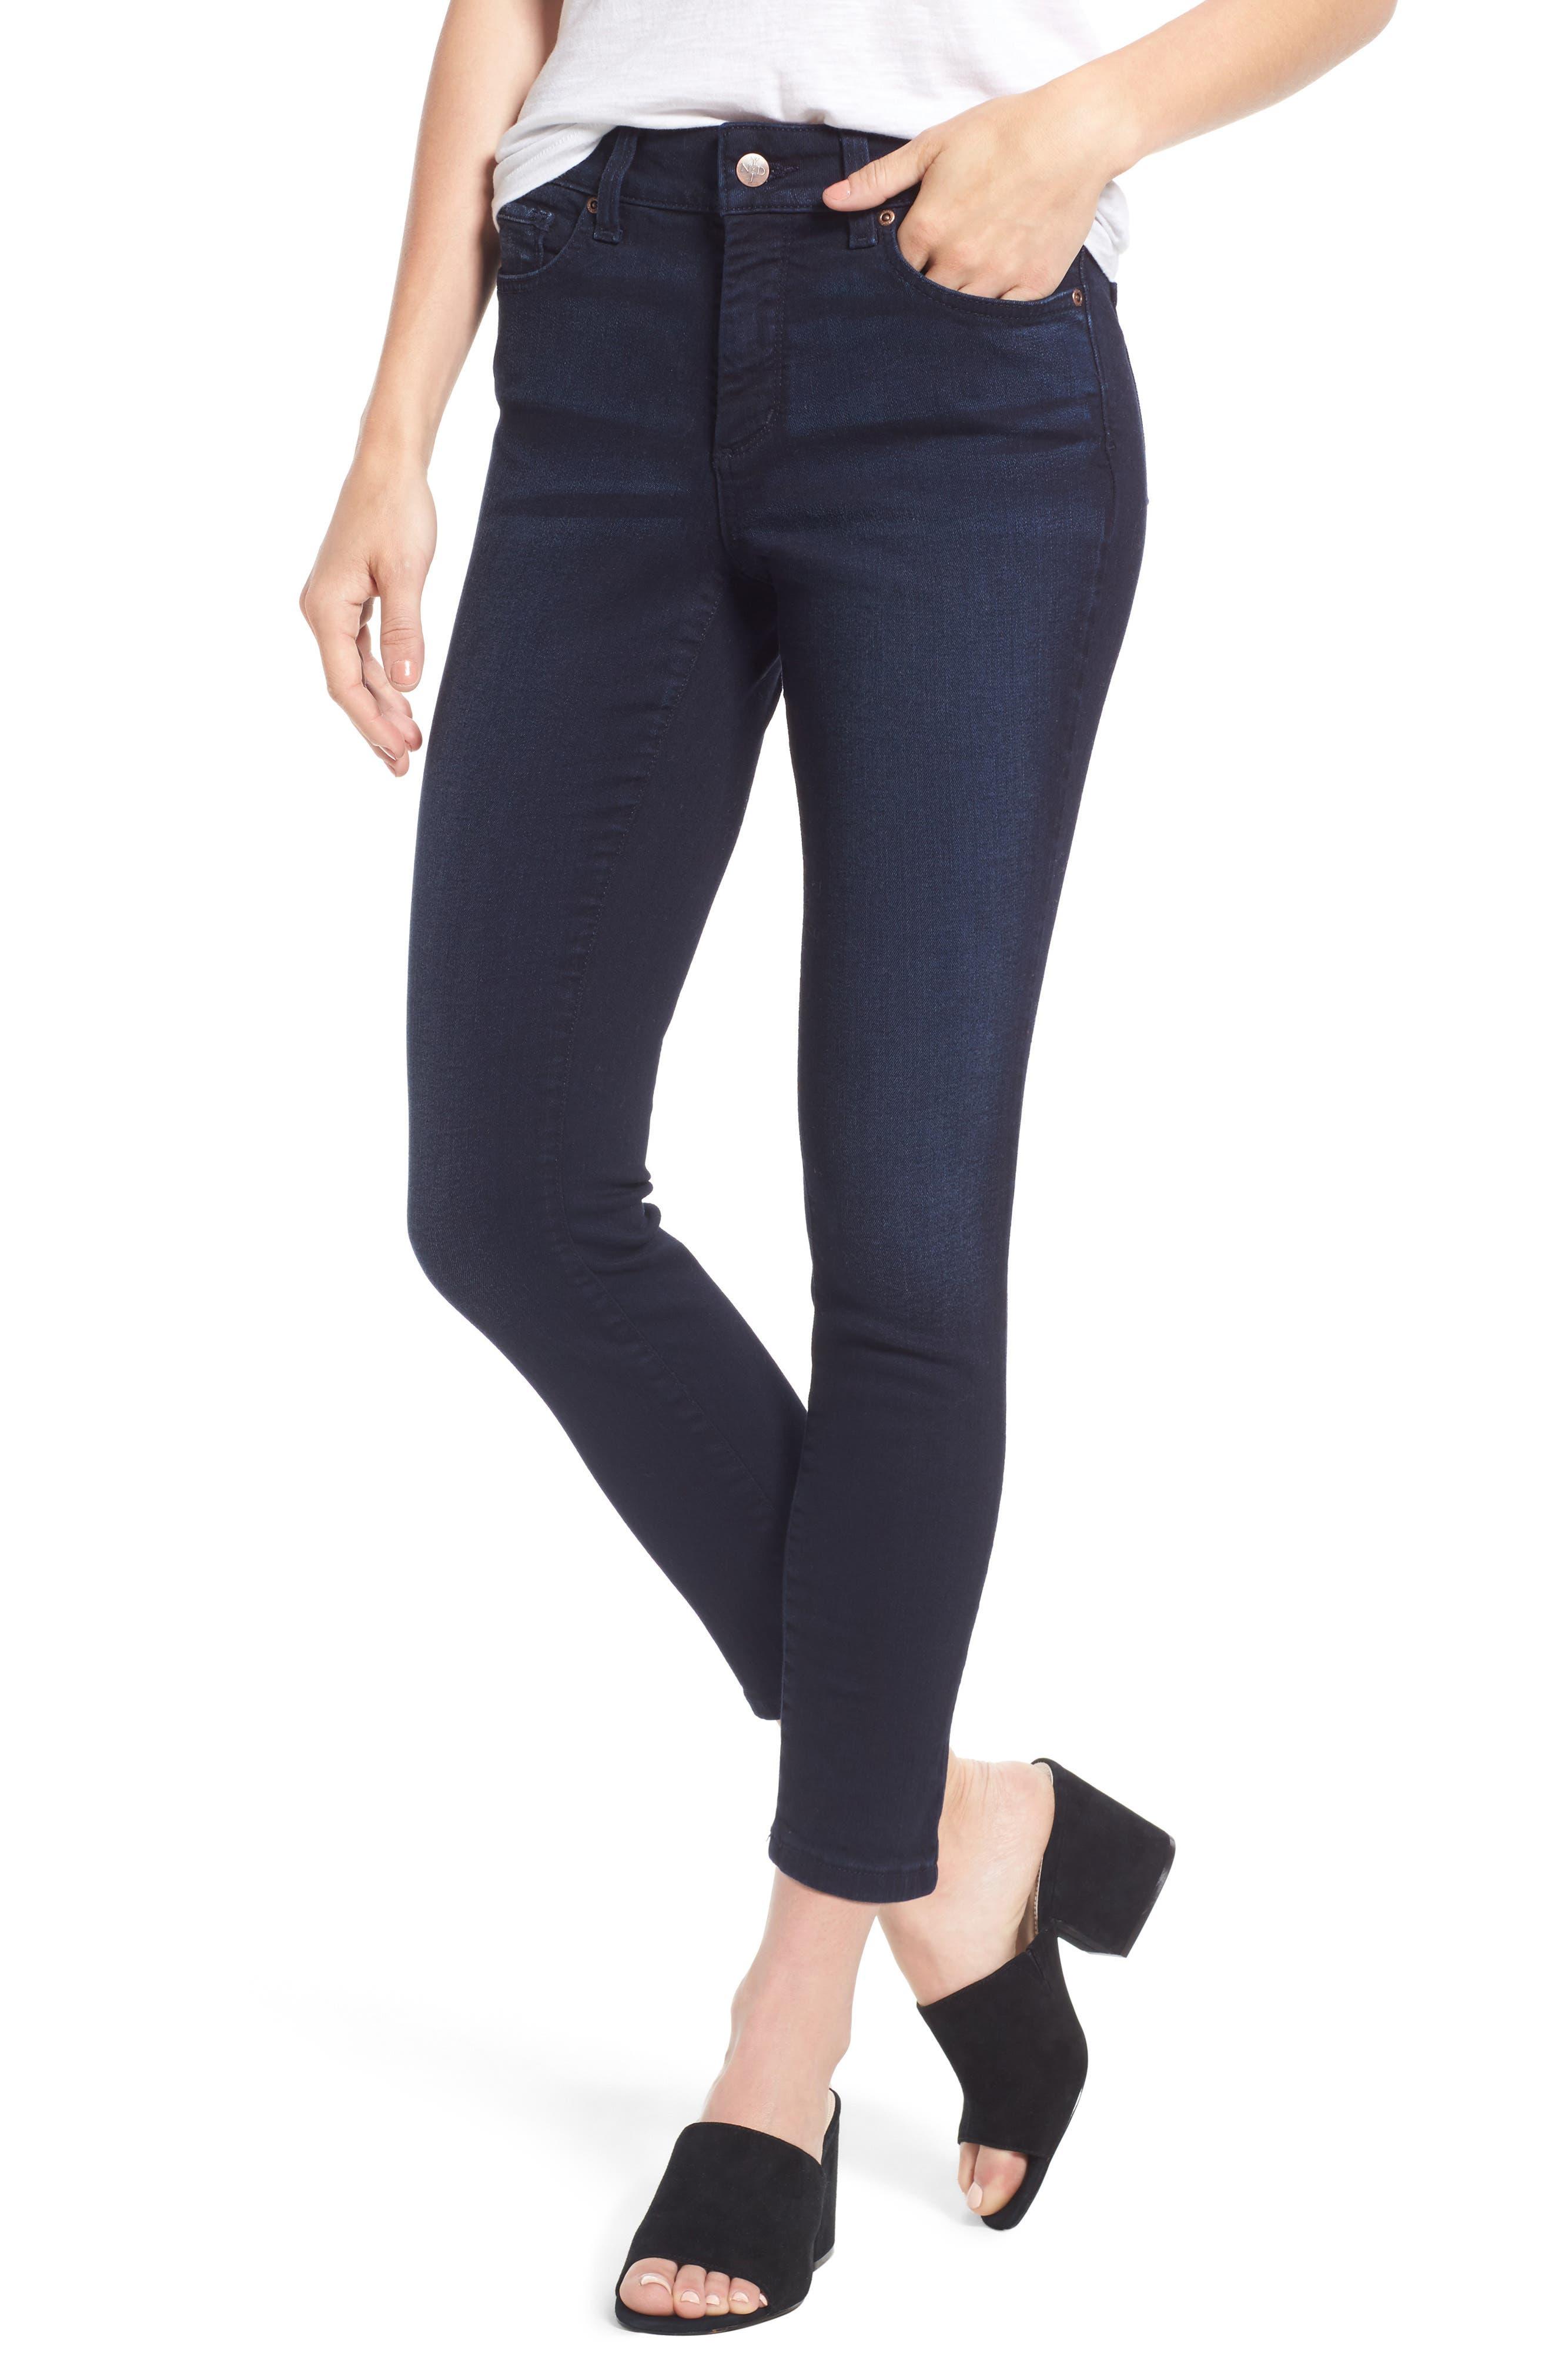 Alternate Image 1 Selected - NYDJ Ami Stretch Ankle Skinny Jeans (Sinclair) (Regular & Petite)